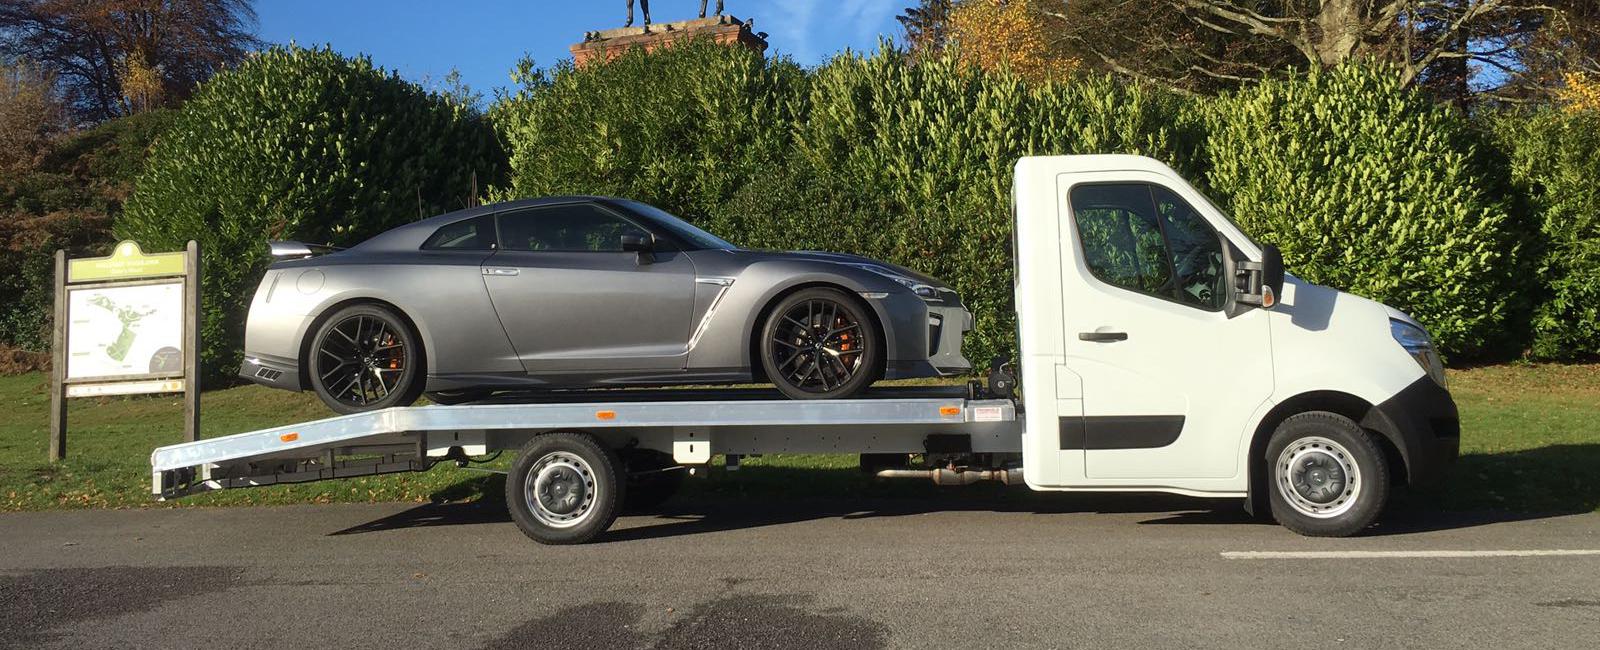 Sports Car loaded onto Car Transporter